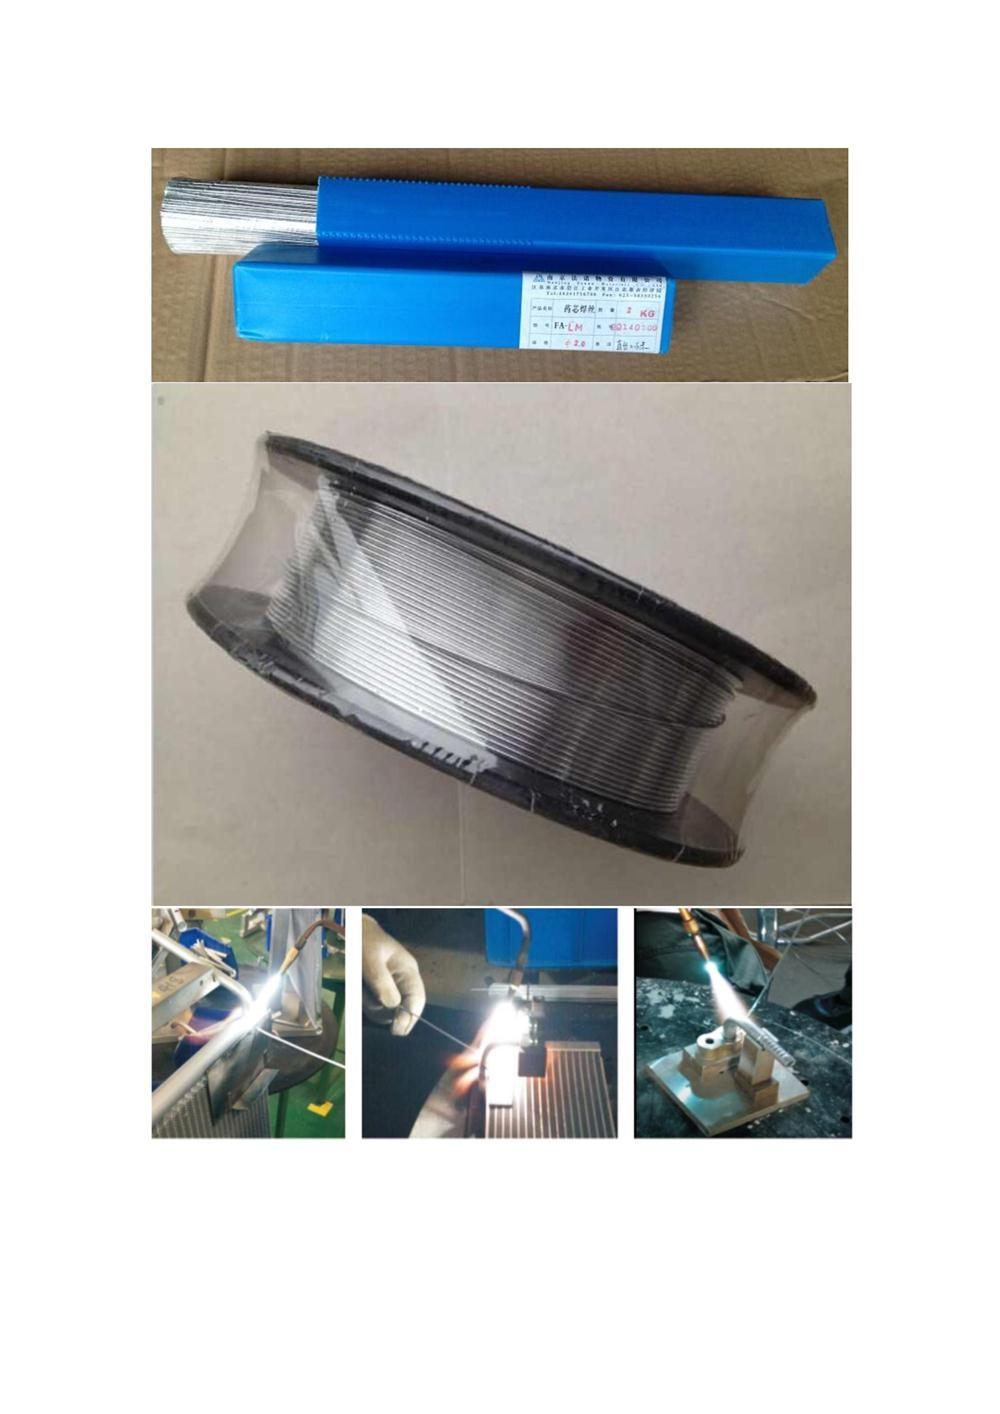 China Aluminum Flux Cored Wire - China Aluminum, Flux-Cored